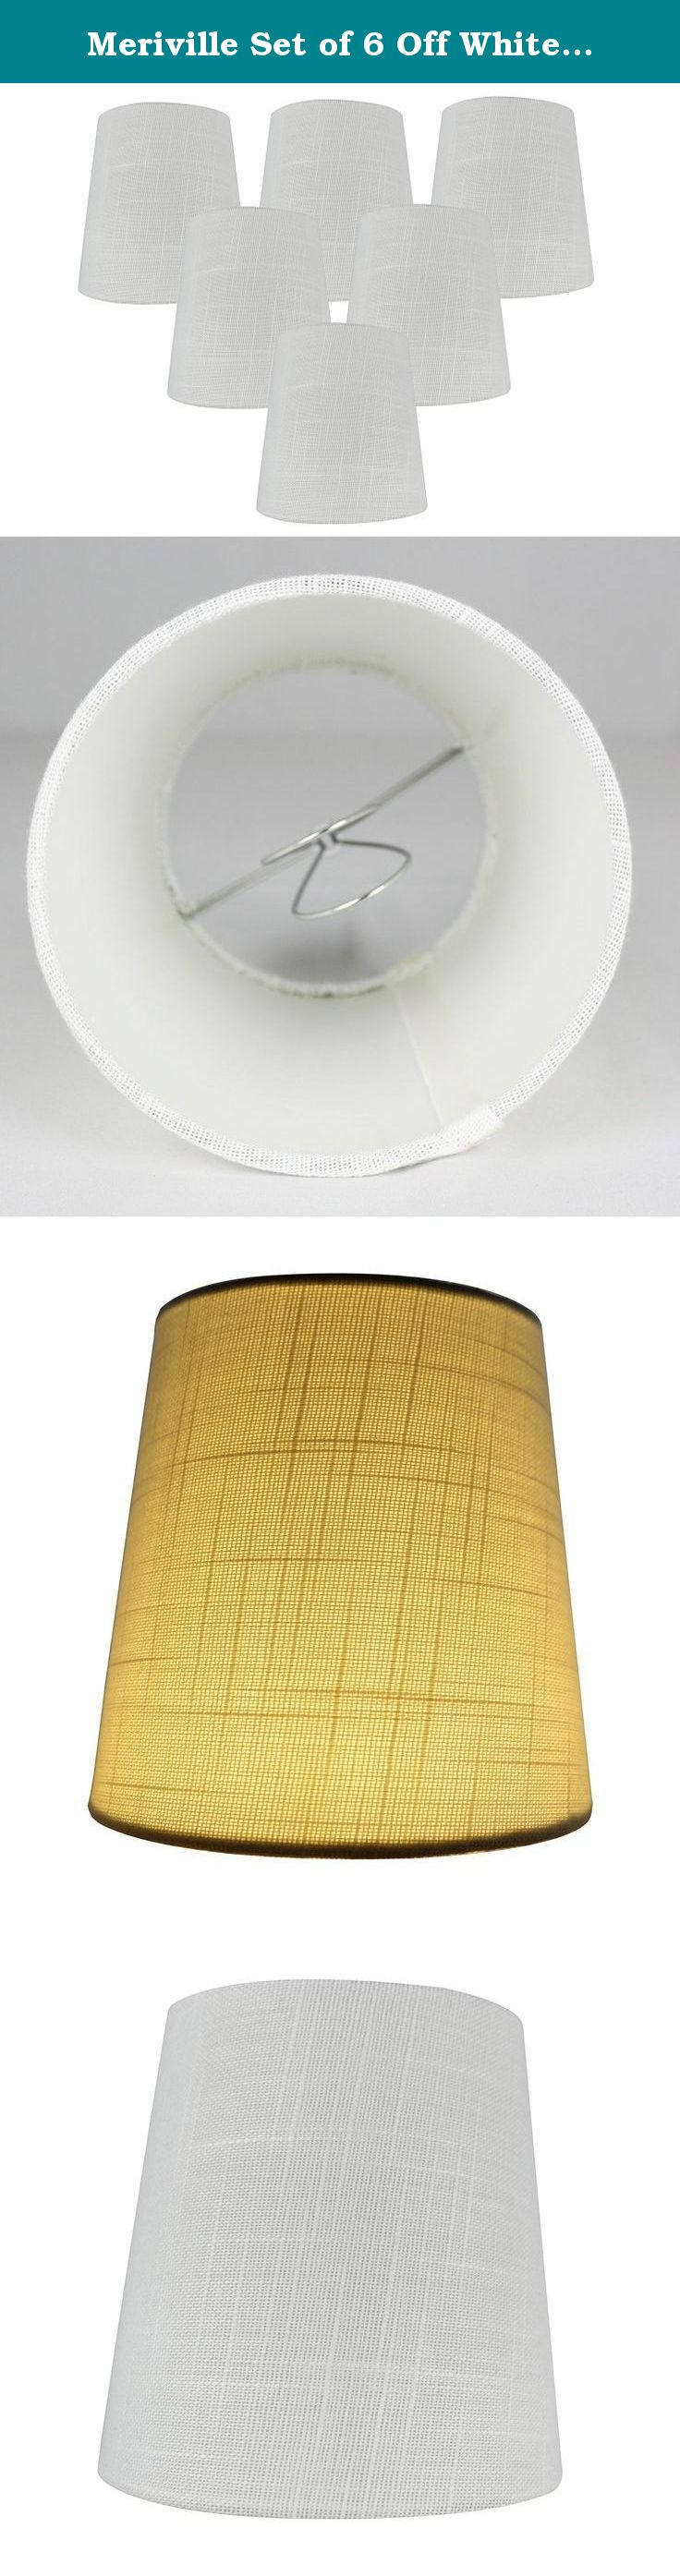 Meriville Set of 6 Off White Linen Clip On Chandelier Lamp Shades ...